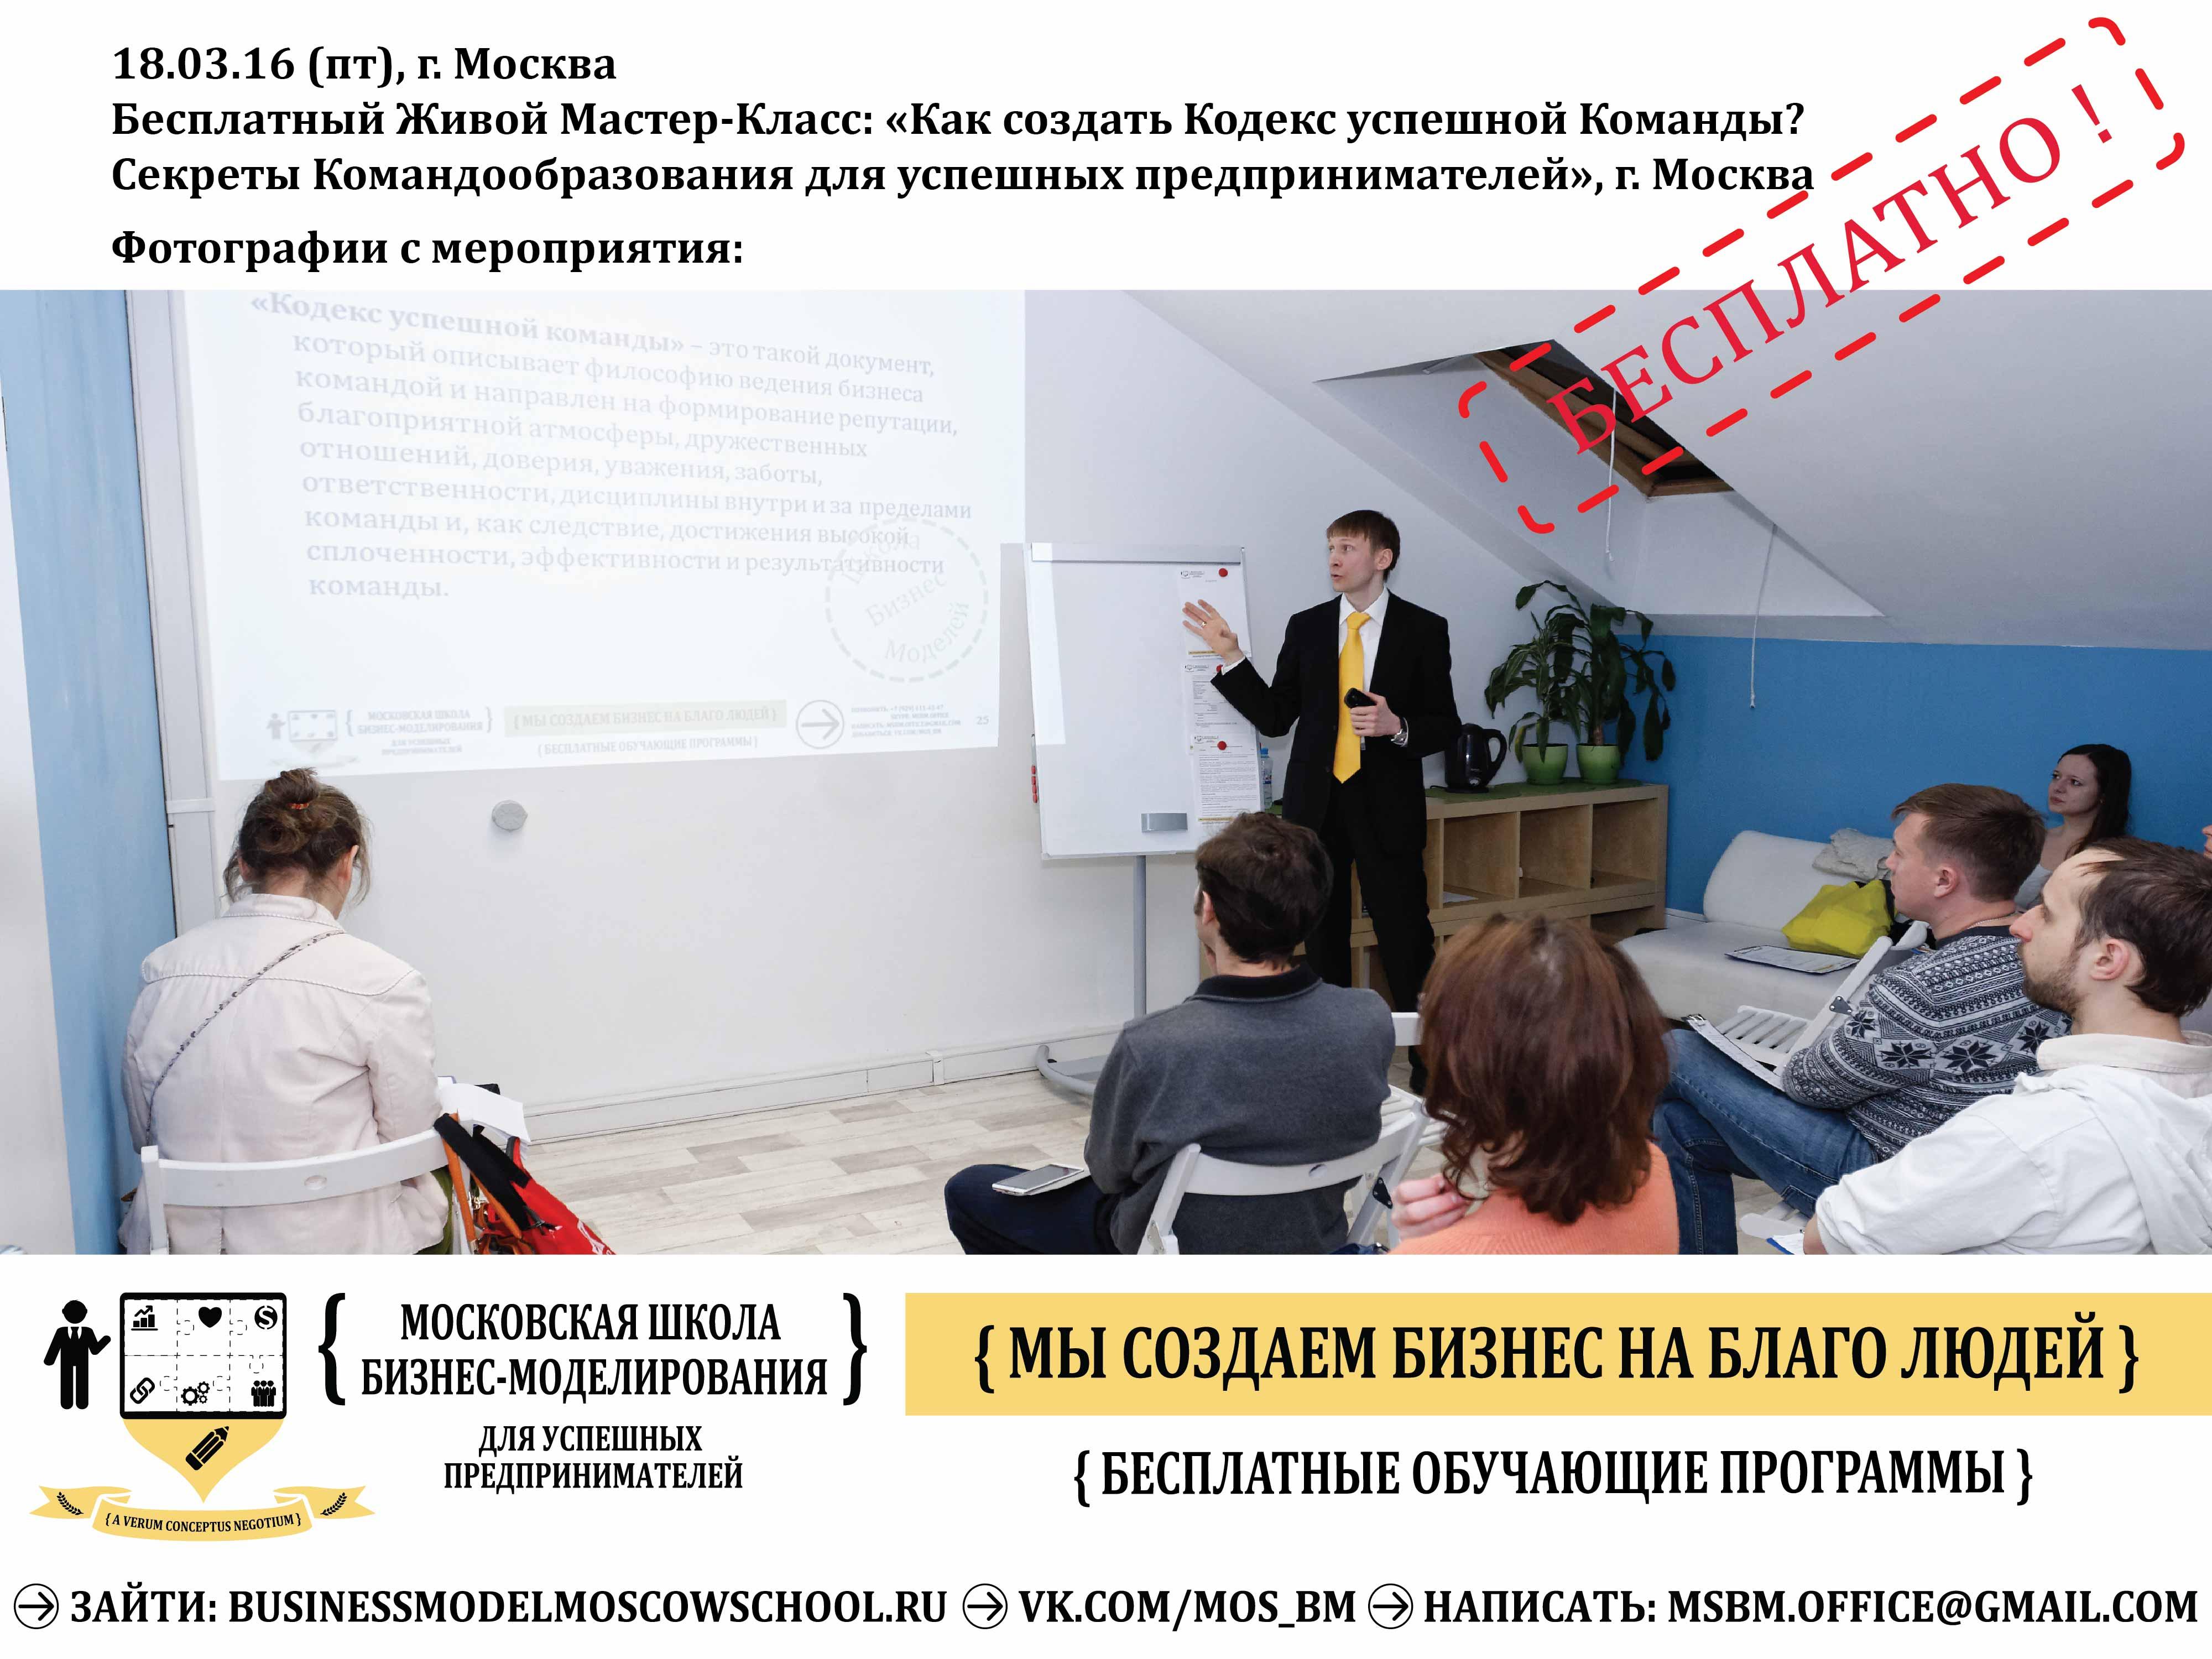 business_model_moscow_school_mclass_photo-18.03.16-2